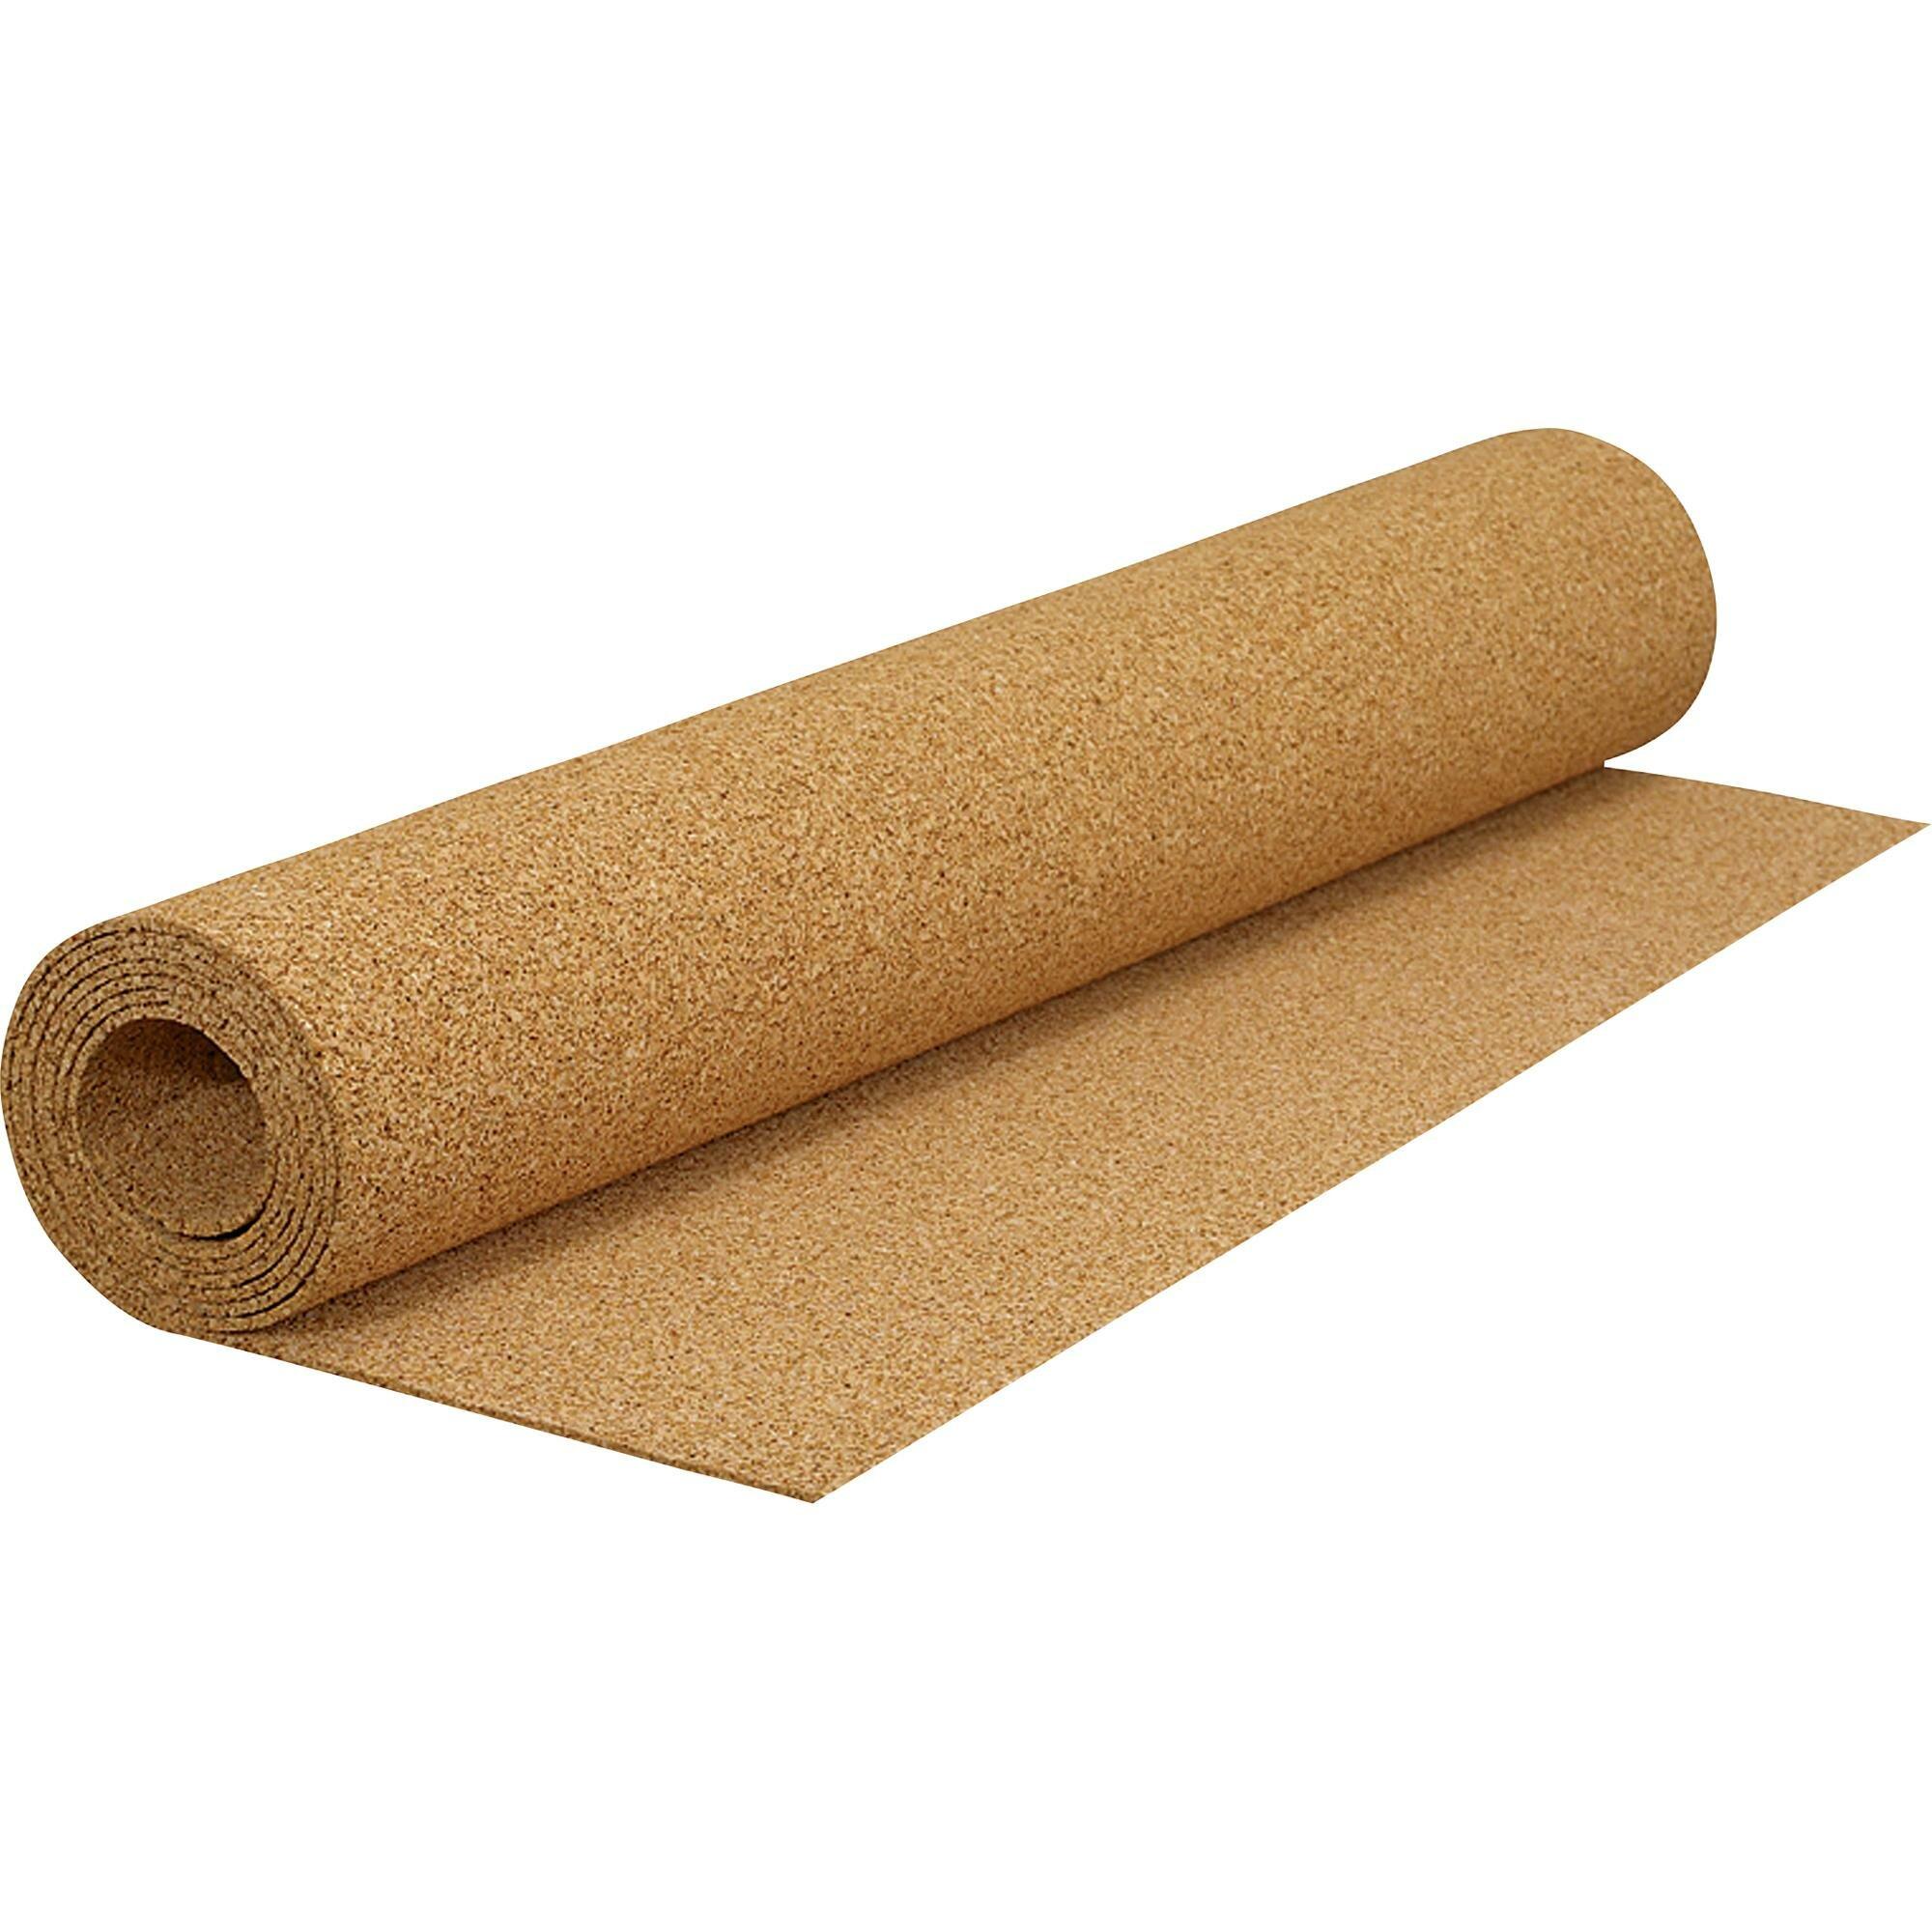 Qep Cork Underlayment Roll 100 Sq Ft